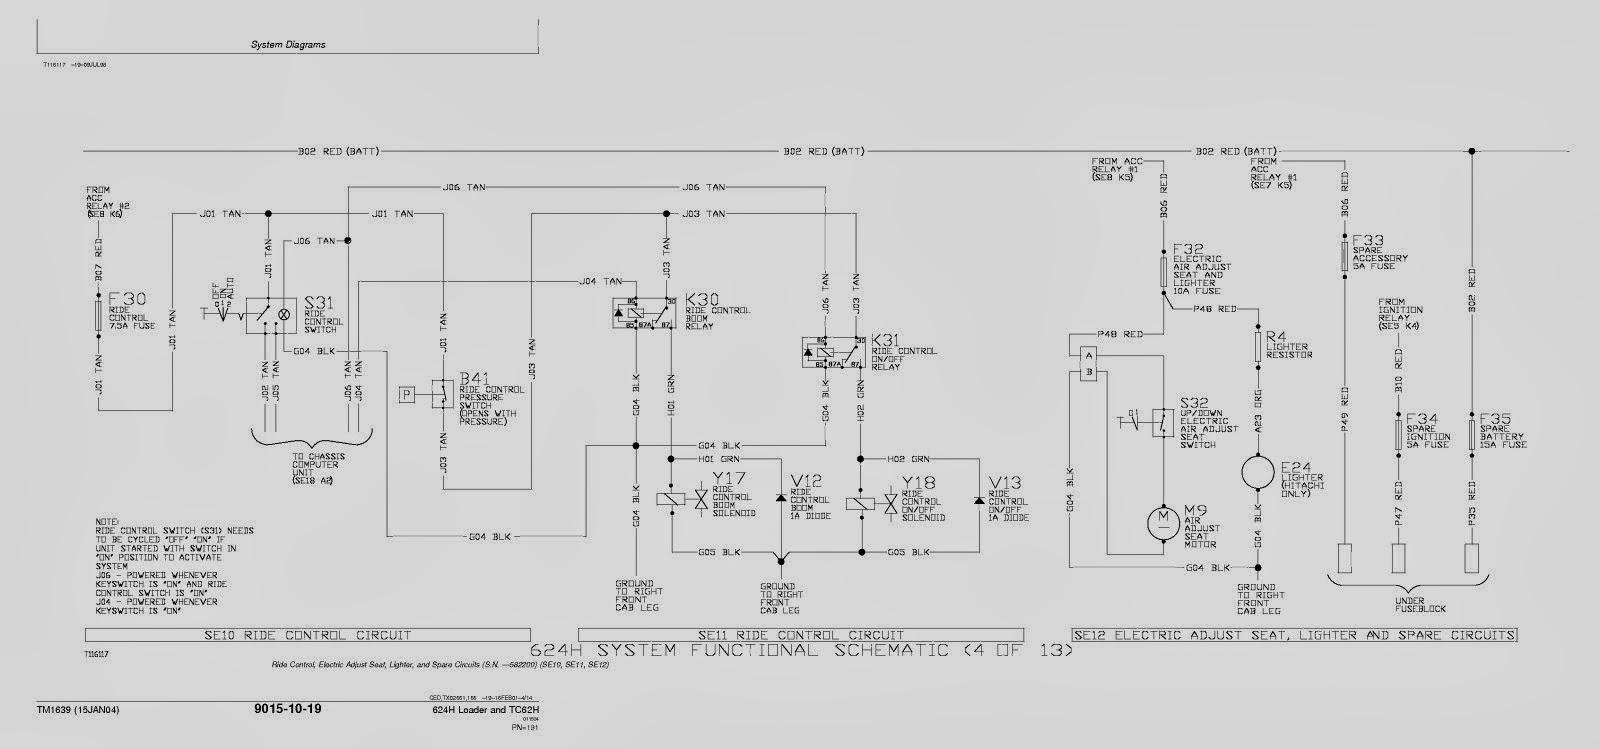 Free owner, service and workshop manual: John Deere 624H